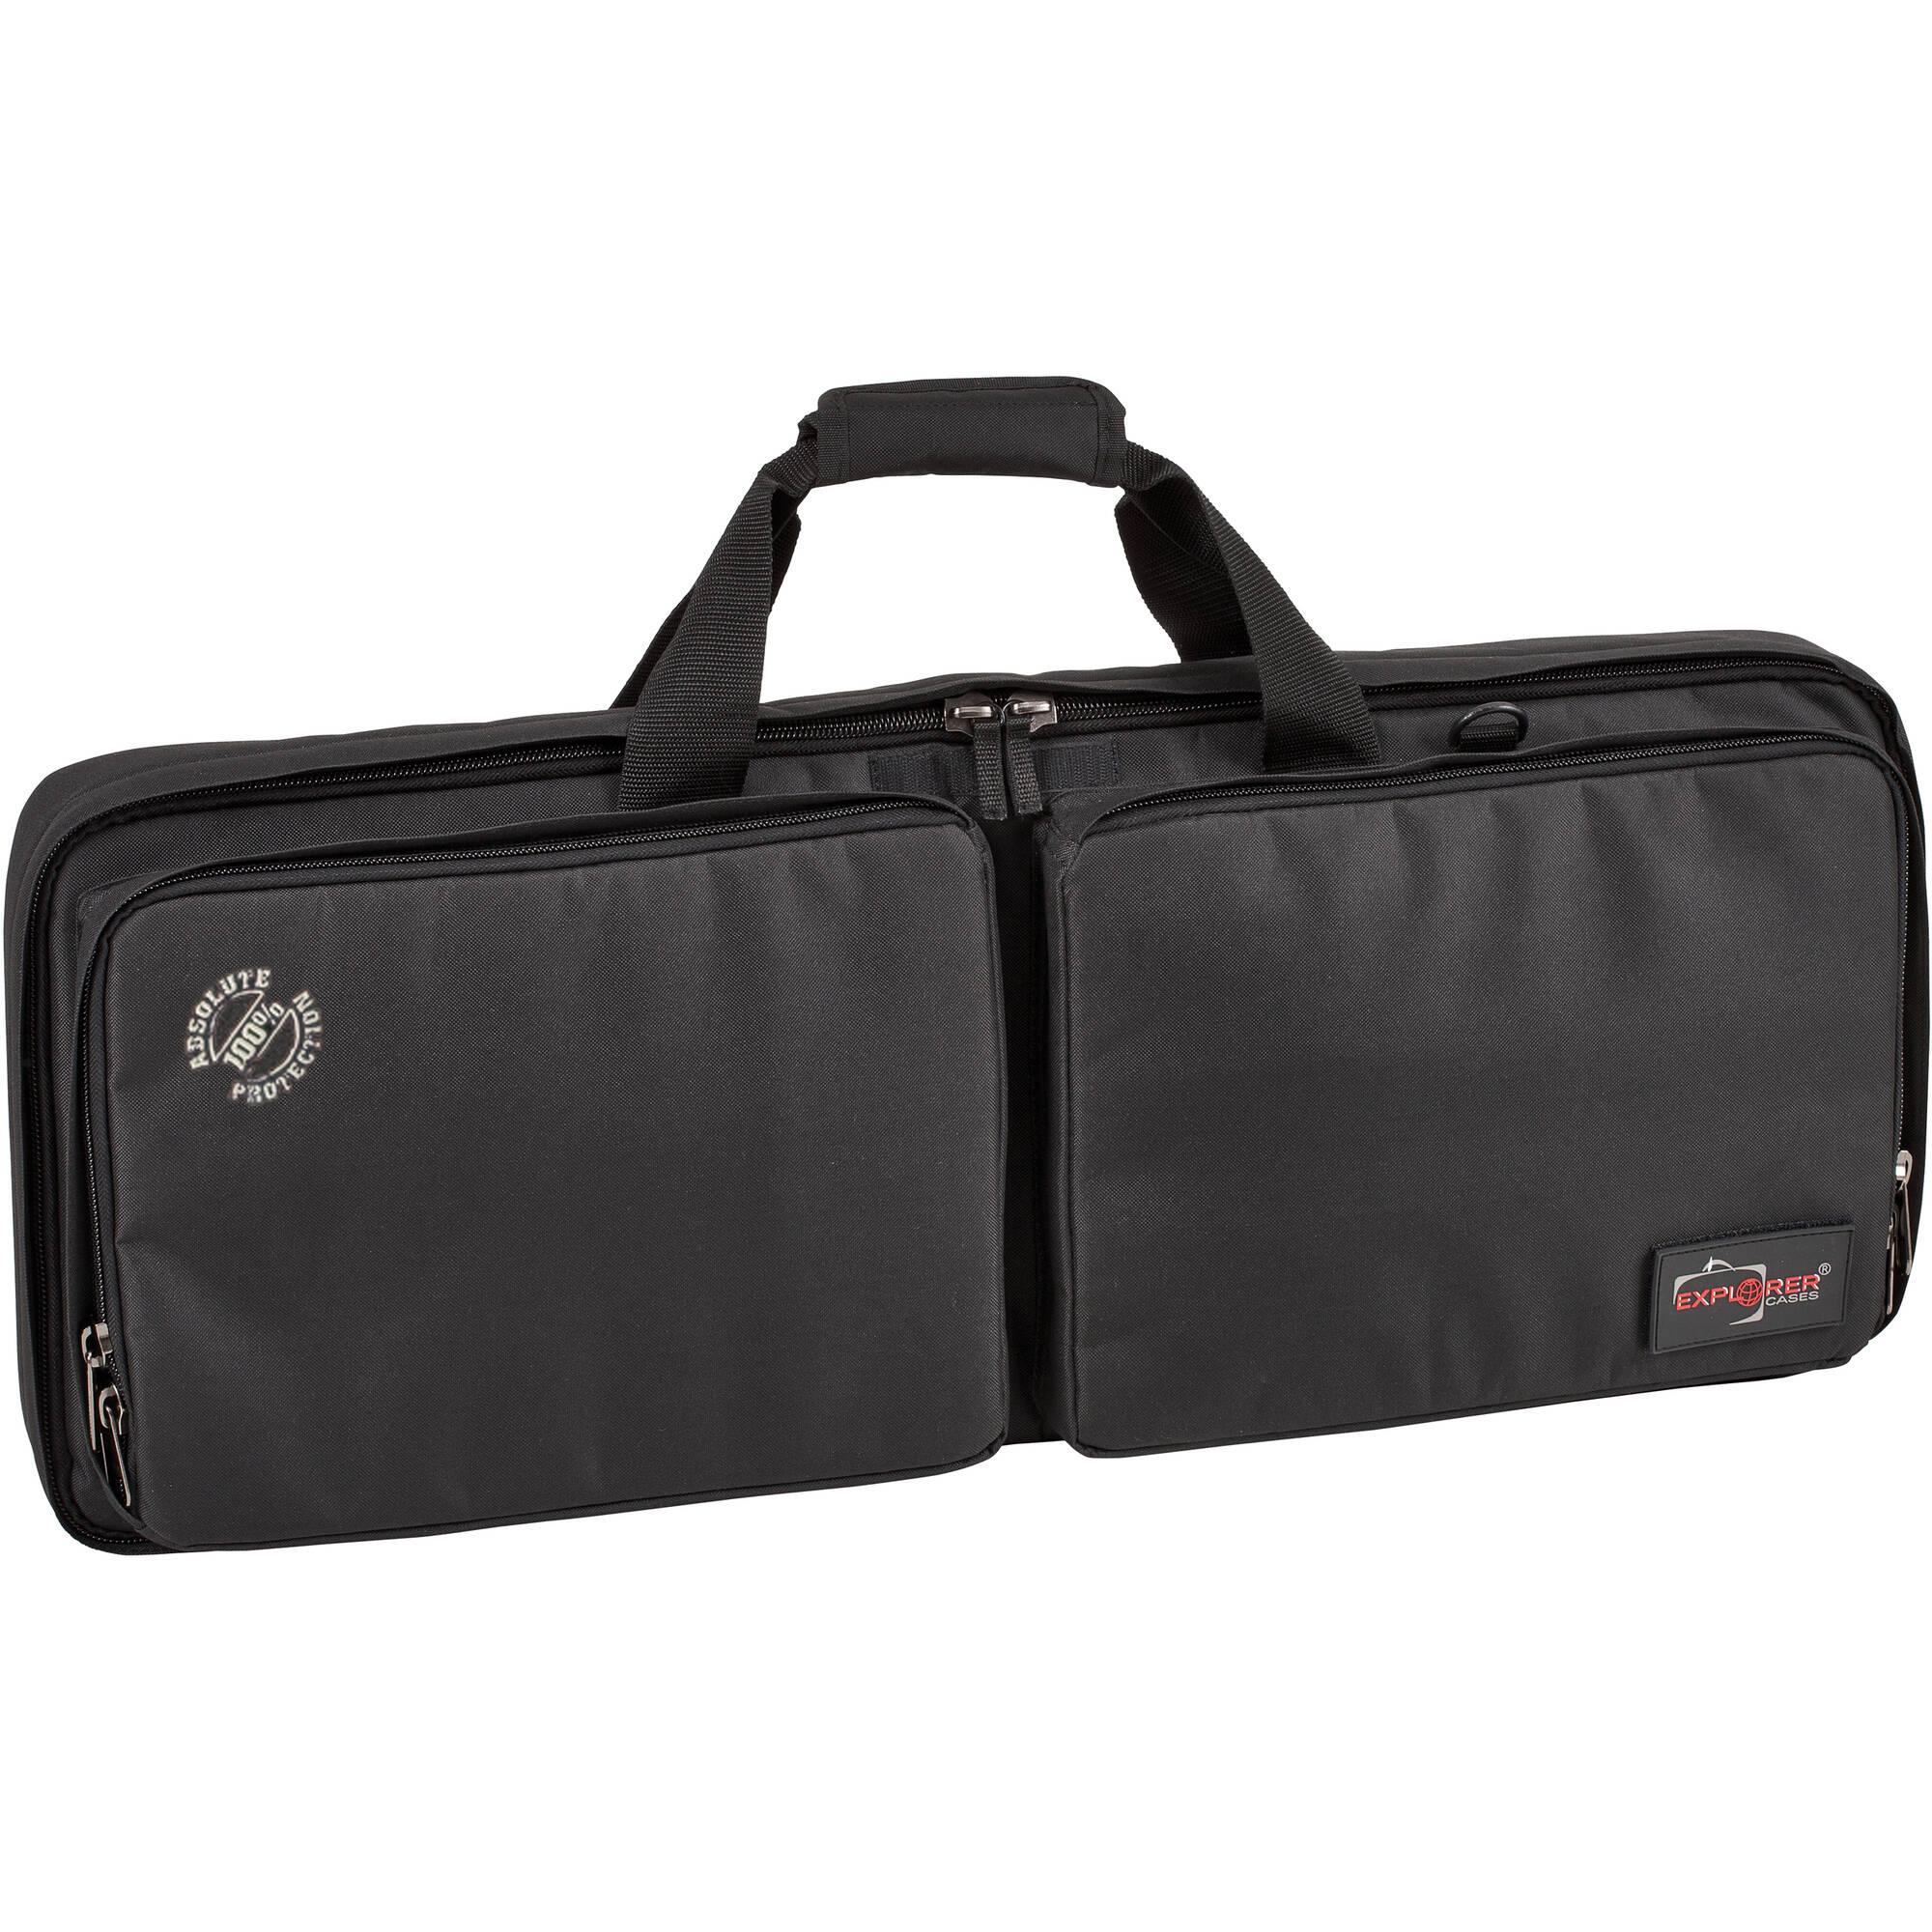 Explorer Cases GUNBAG 108 Padded Rifle /& Magazine Bag fits 10826 10840 Hard Case